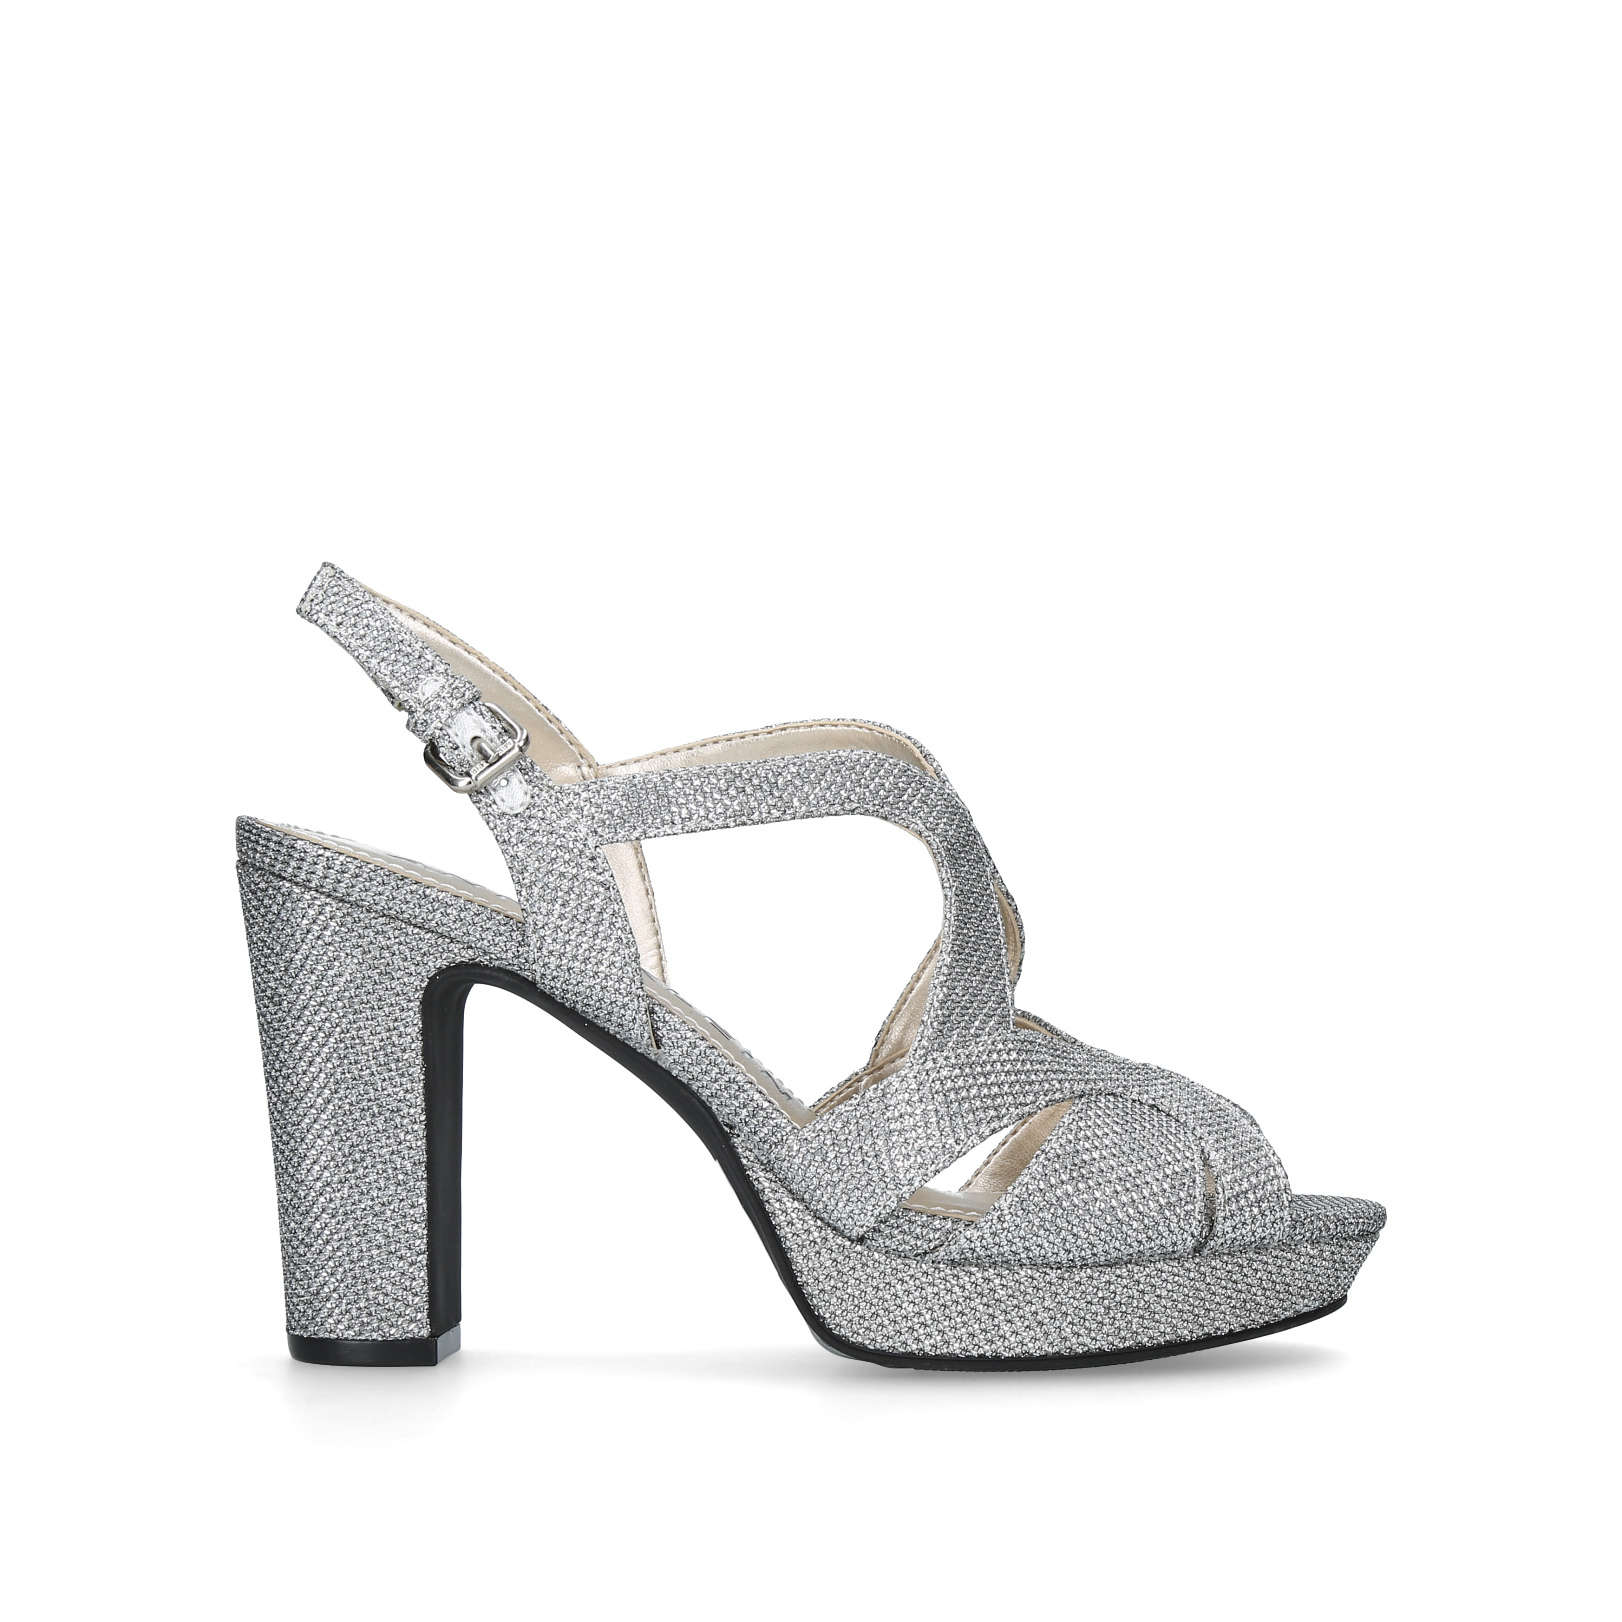 5d5d56cc71f PETRIA Anne Klein Petria Silver Occasion Heels Block Heel by ANNE KLEIN